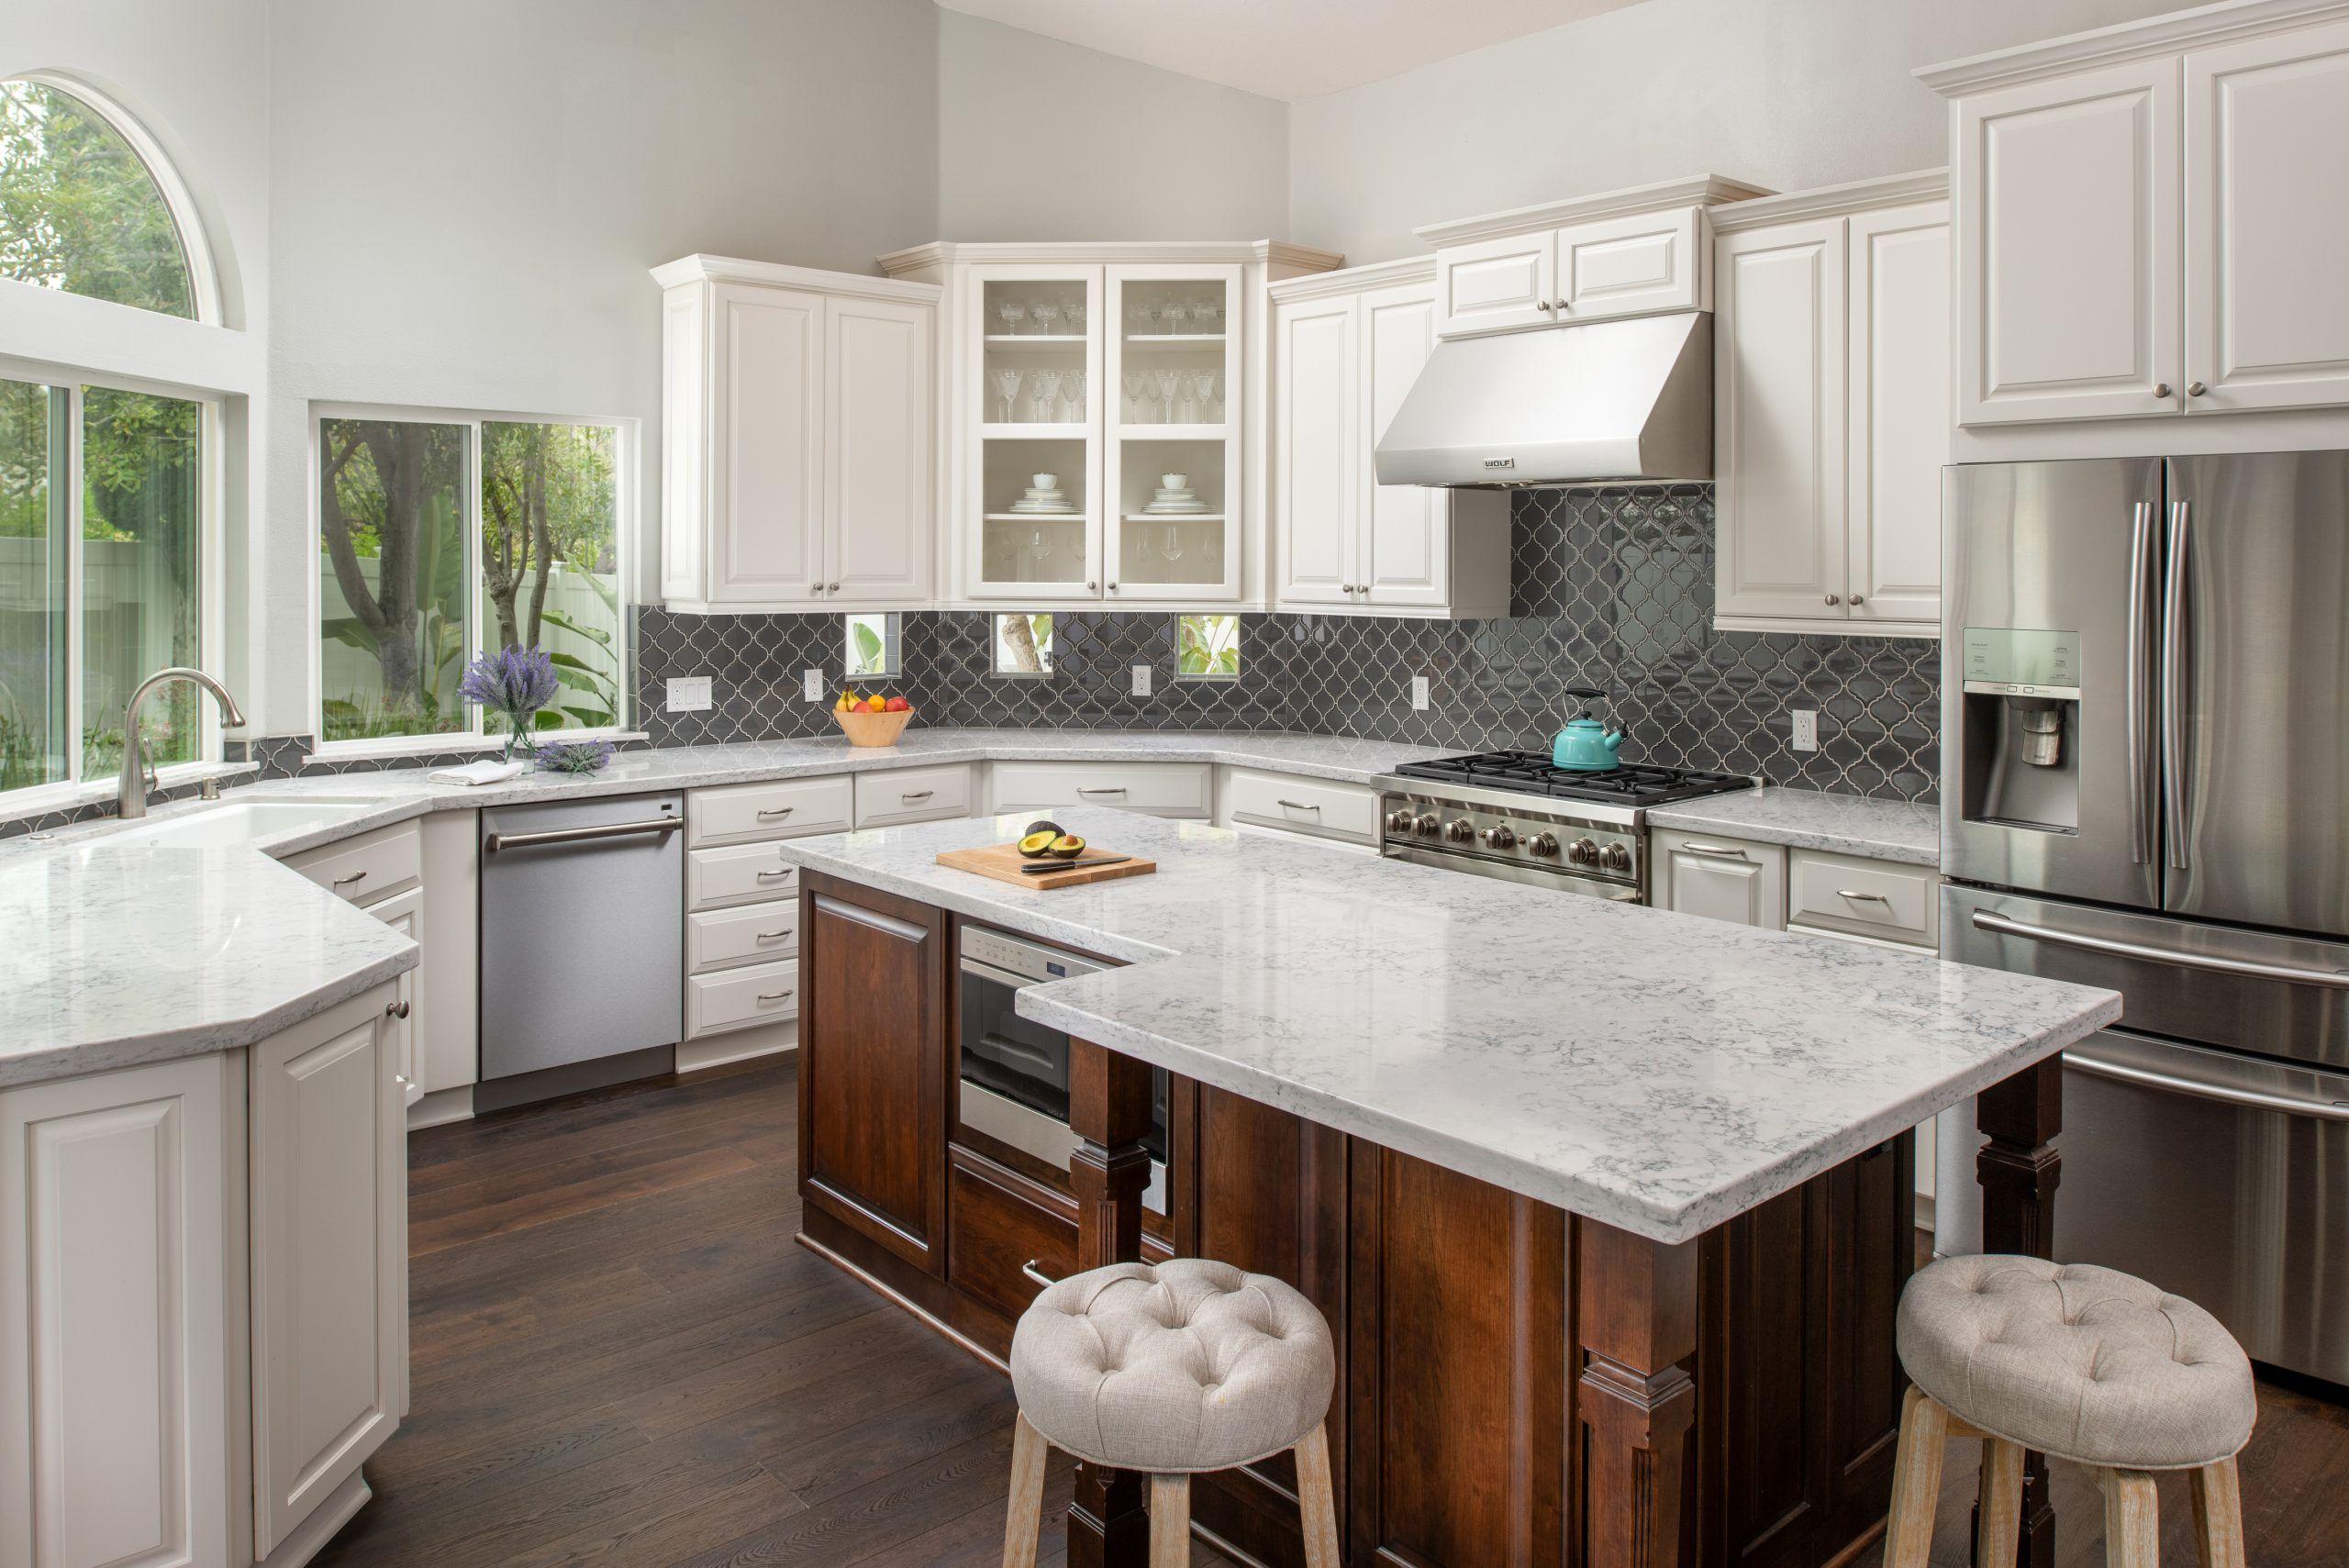 Kitchen Remodeling San Diego in 2020   Kitchen remodel ...